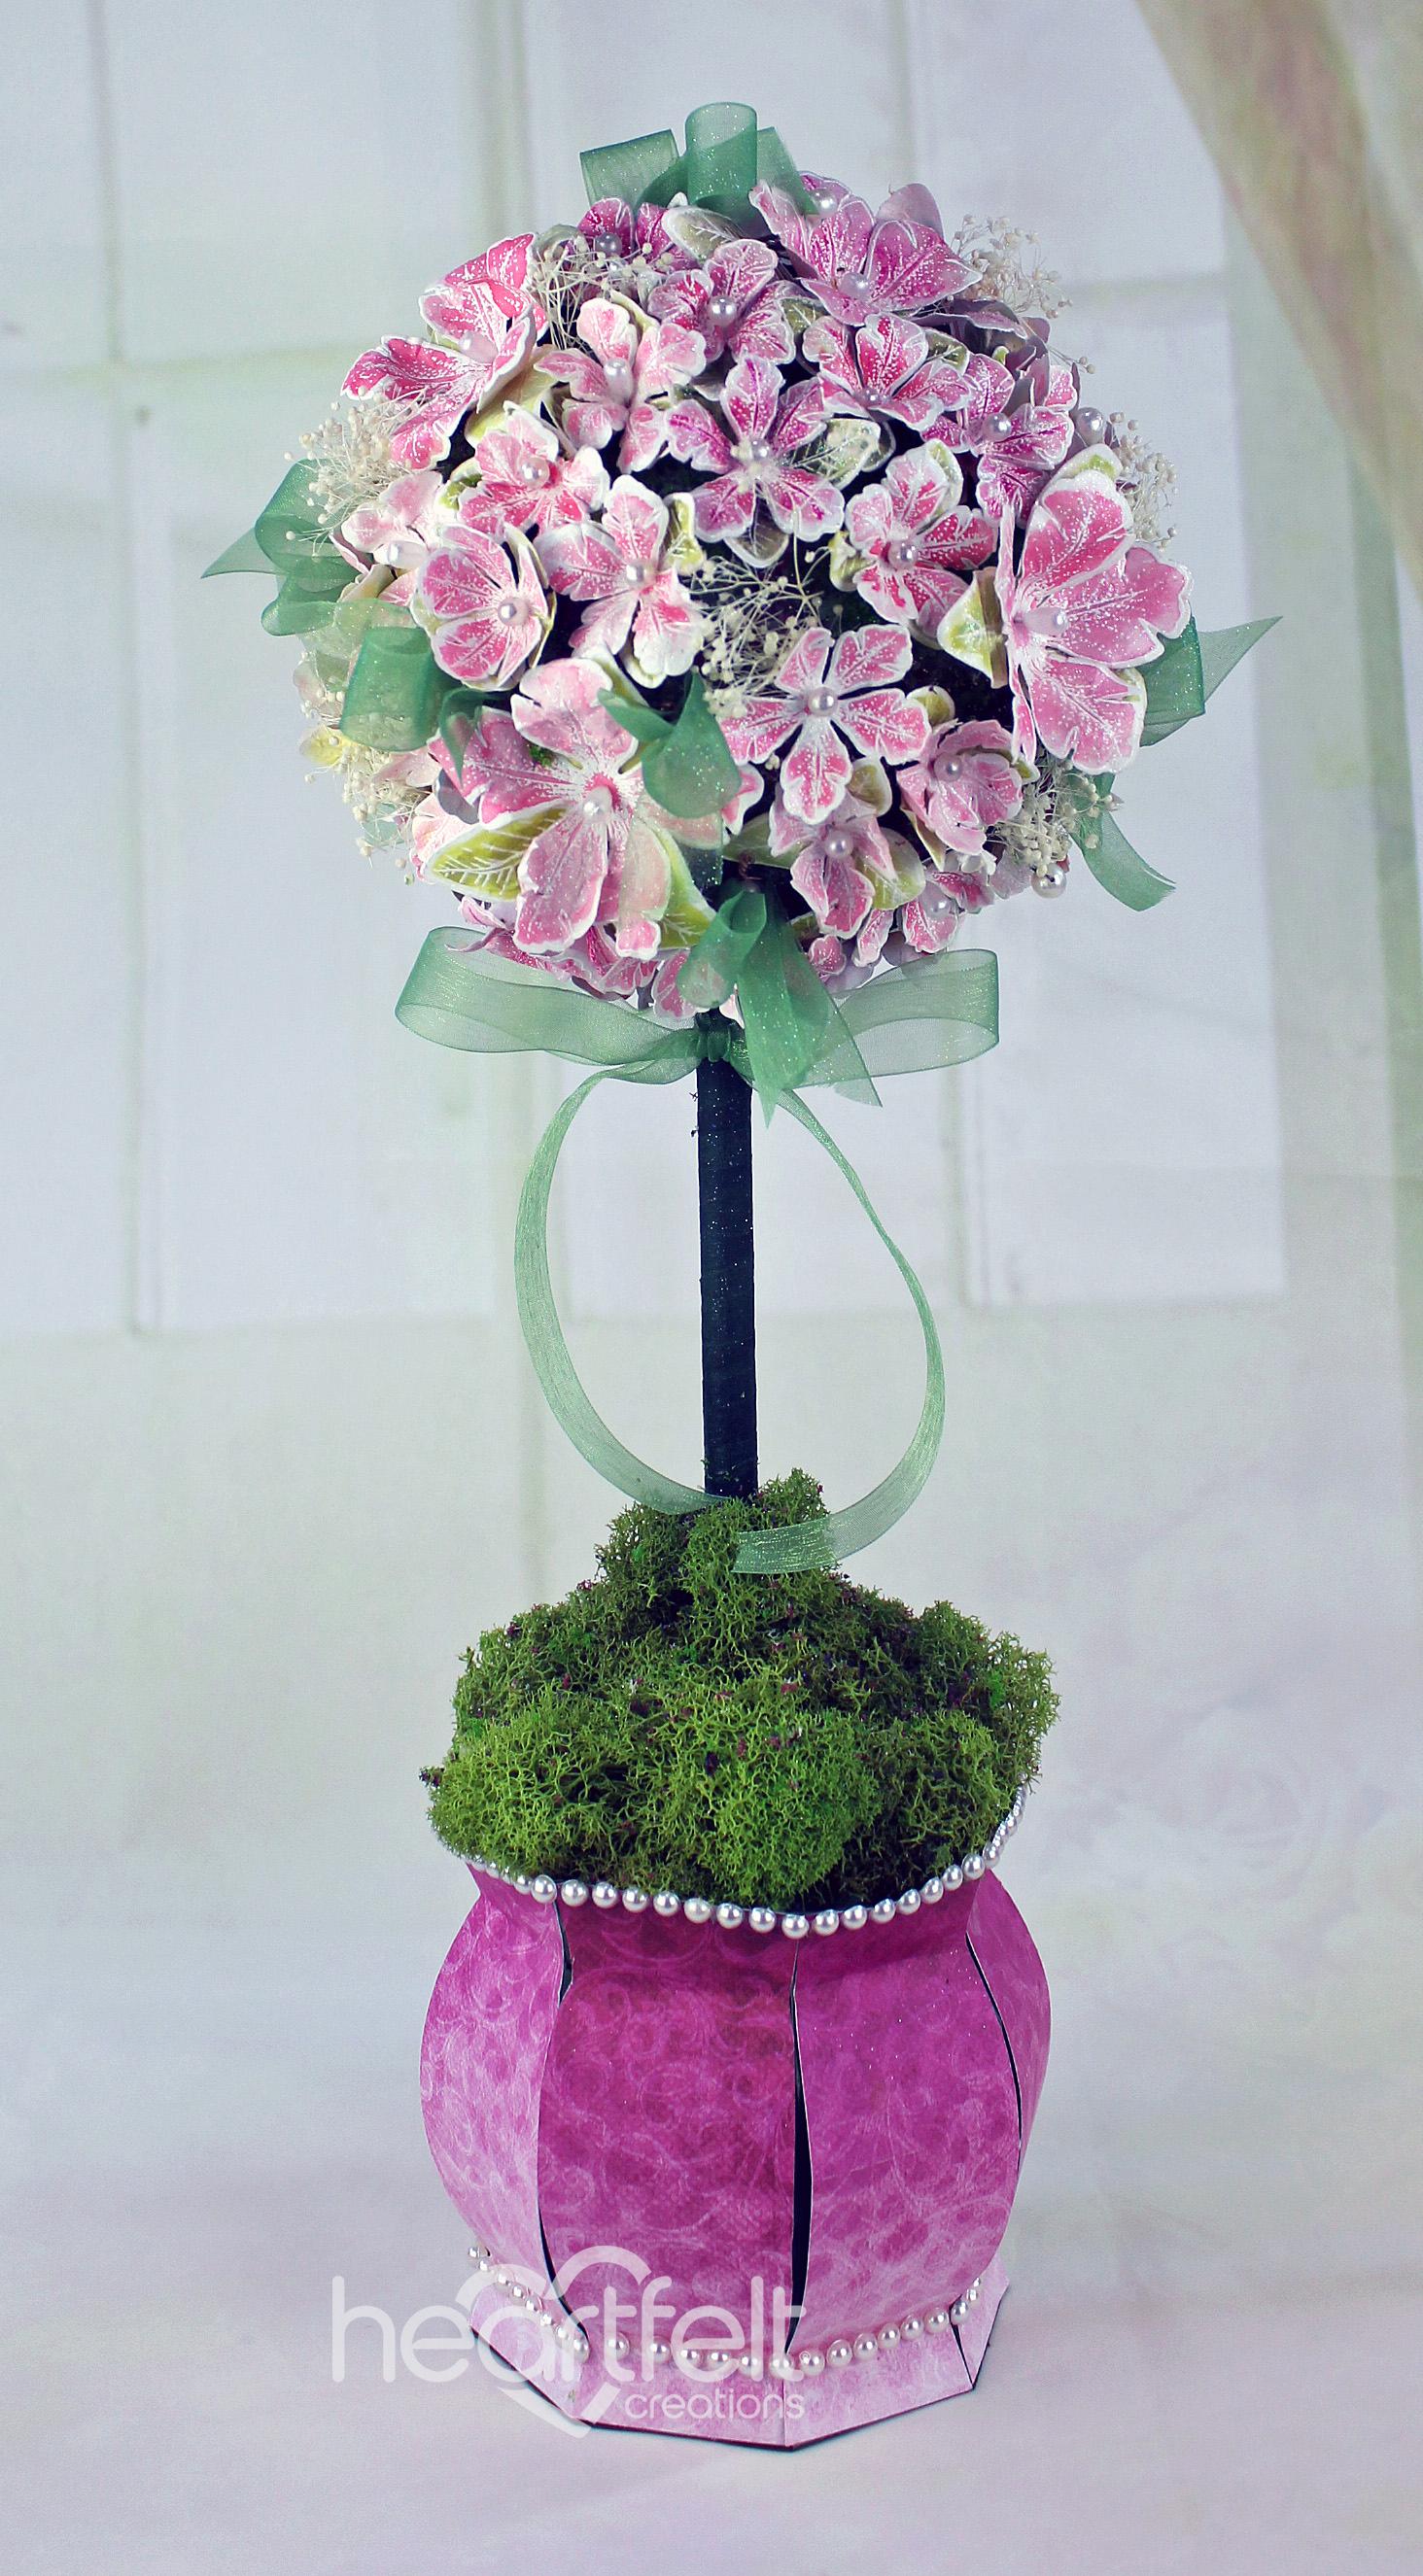 Gallery Petunia Floral Topiary Heartfelt Creations